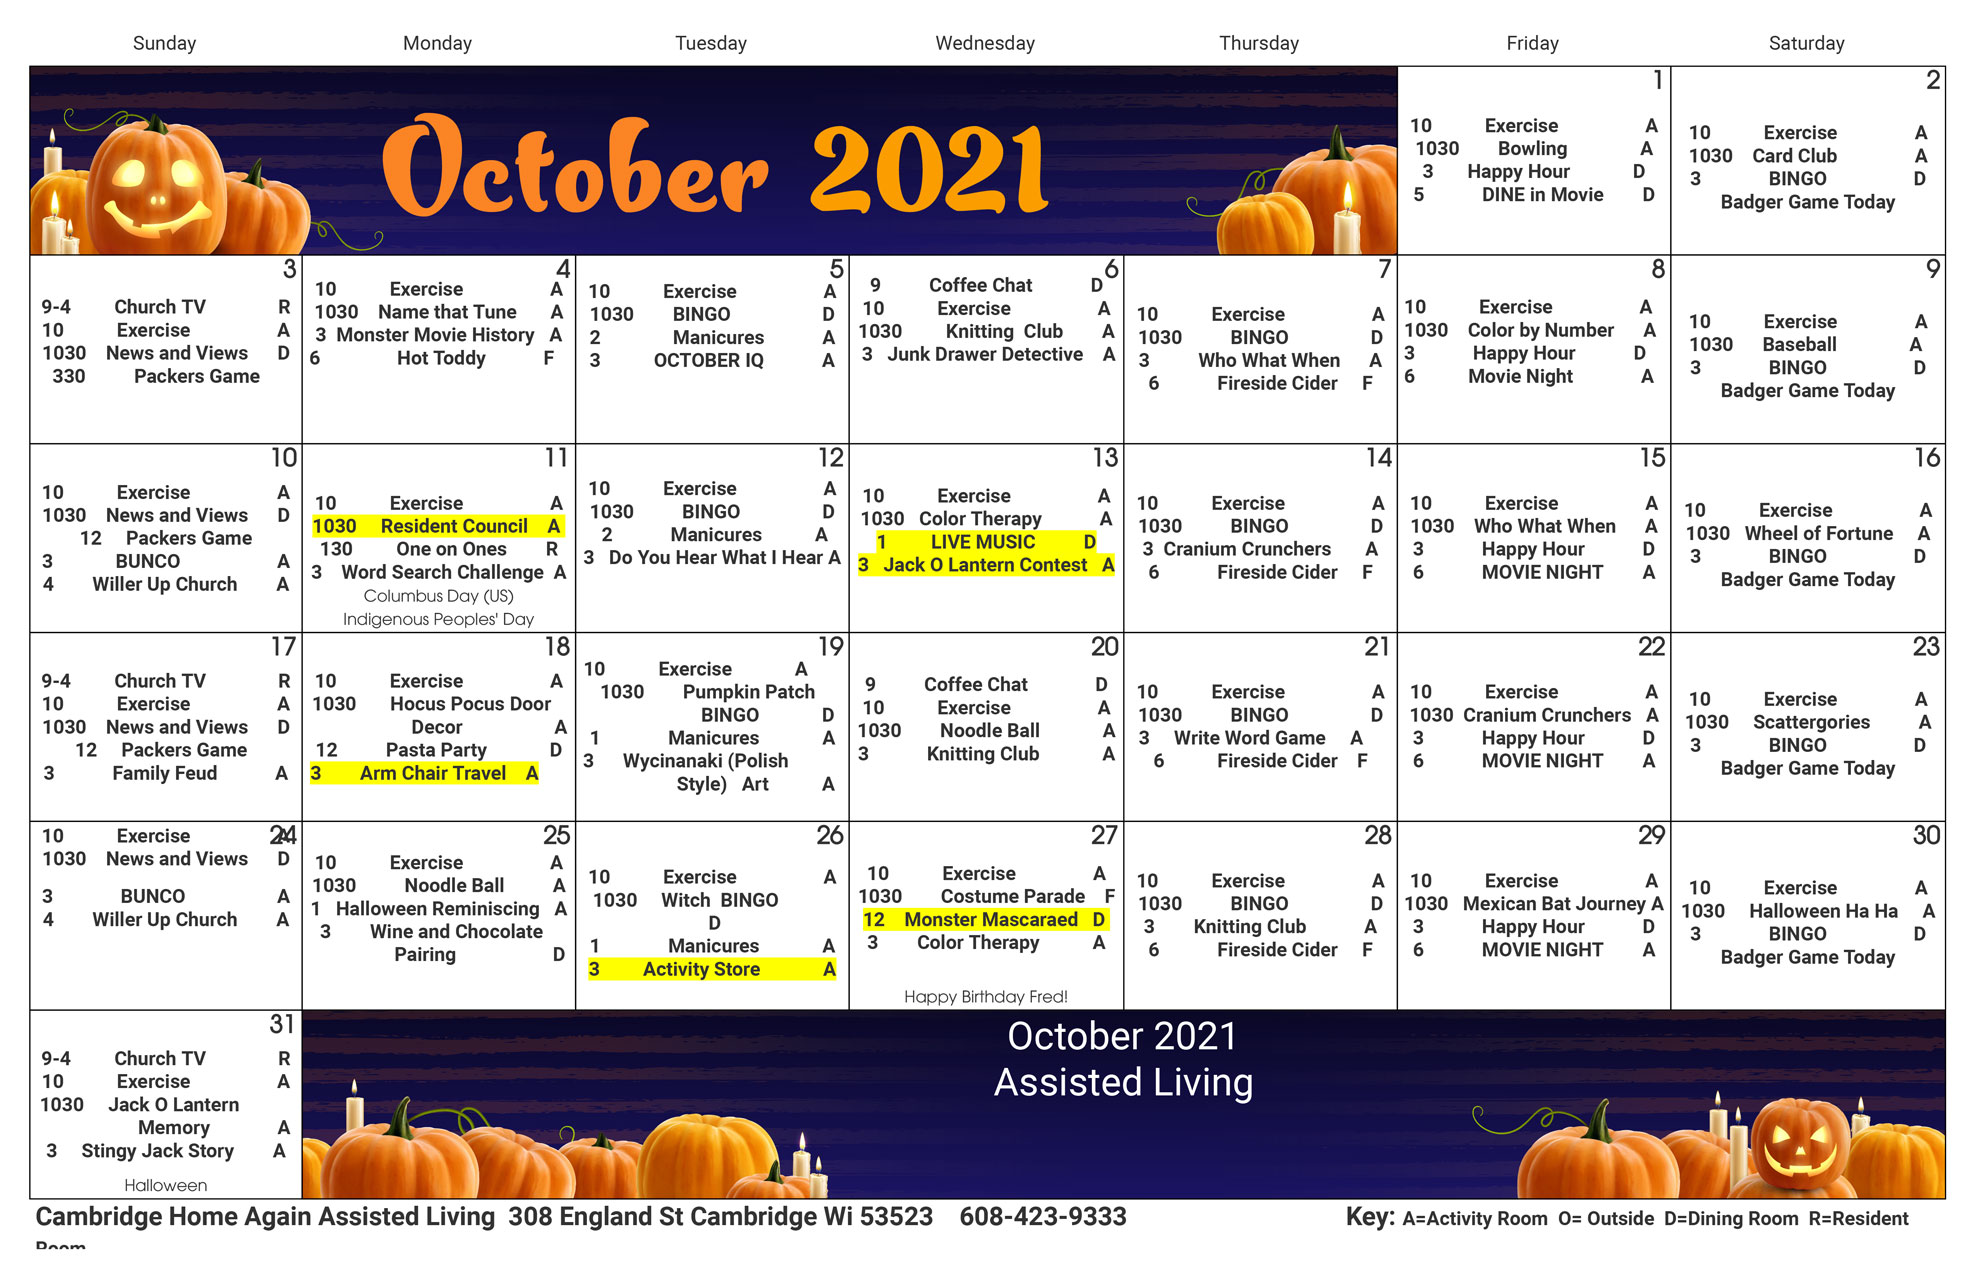 Cambridge Assisted Living October 2021 Activity Calendar